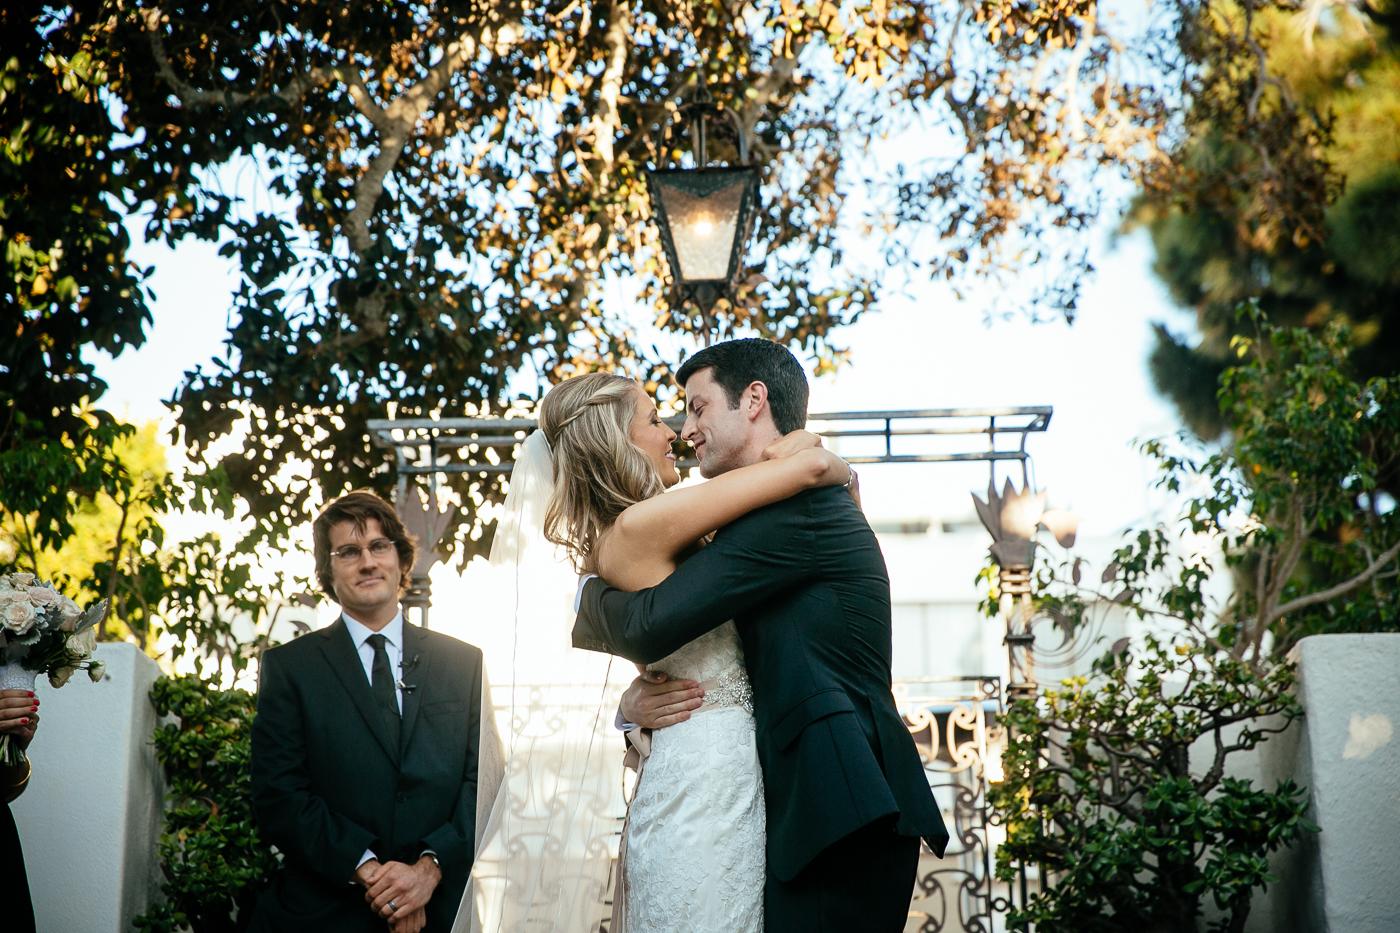 RYAN_&_KELLEY_DARLINGTON_HOUSE_WEDDING_2014_7X9A2153.JPG